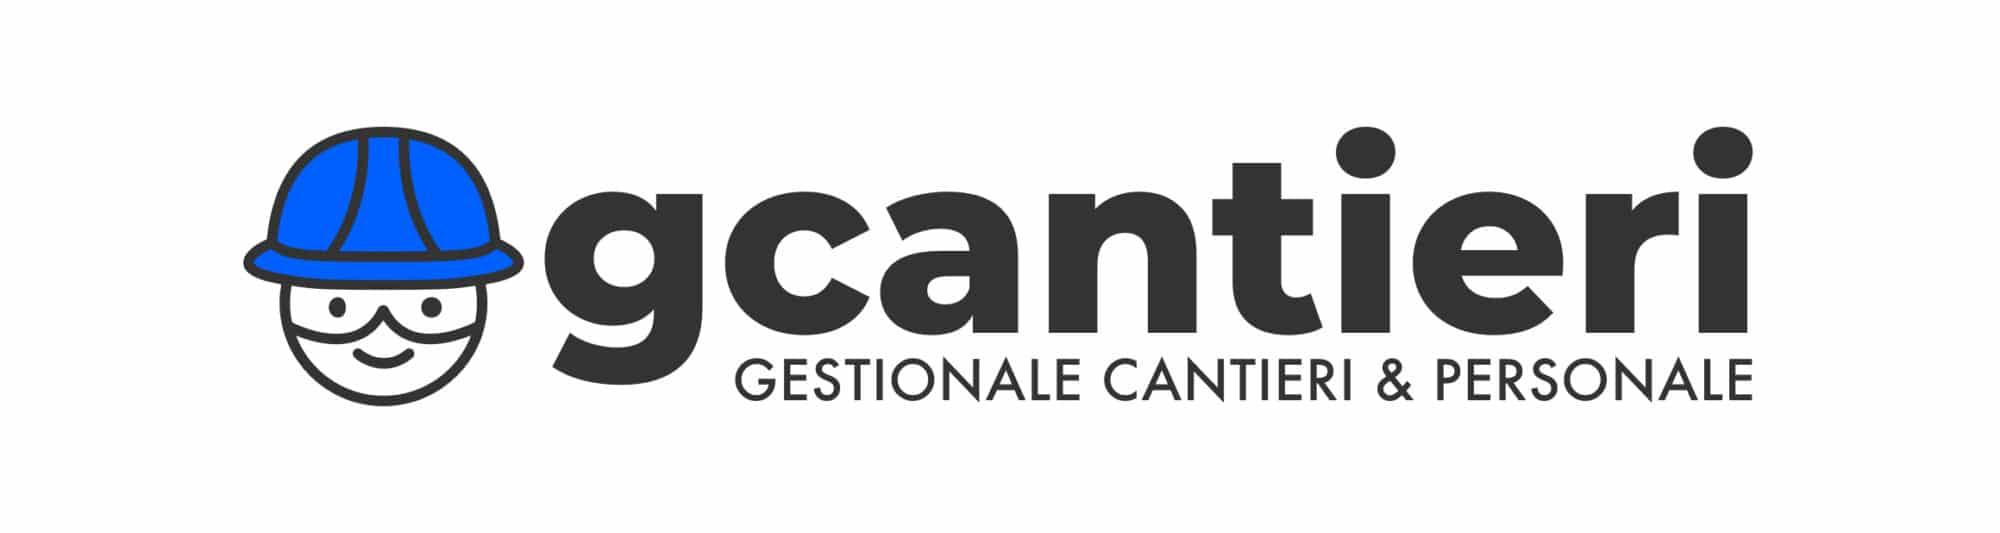 logo gcantieri sfondo bianco - Gcantieri - Gestionale Cantieri e Personale